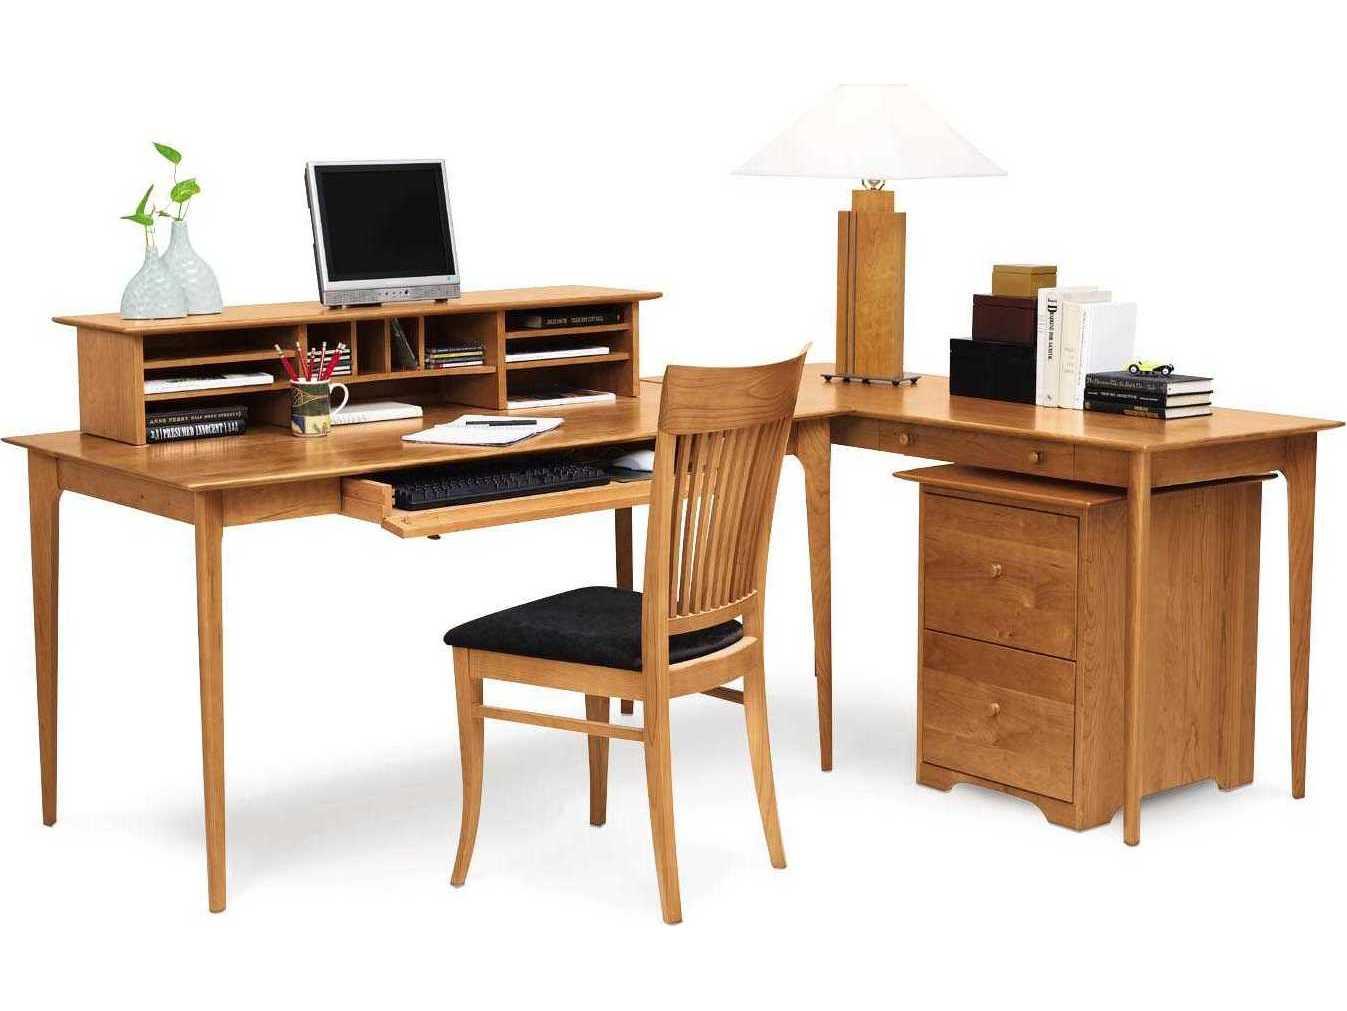 Copeland Furniture Sarah 60 L X 30 W Rectangular Return Credenza Desk